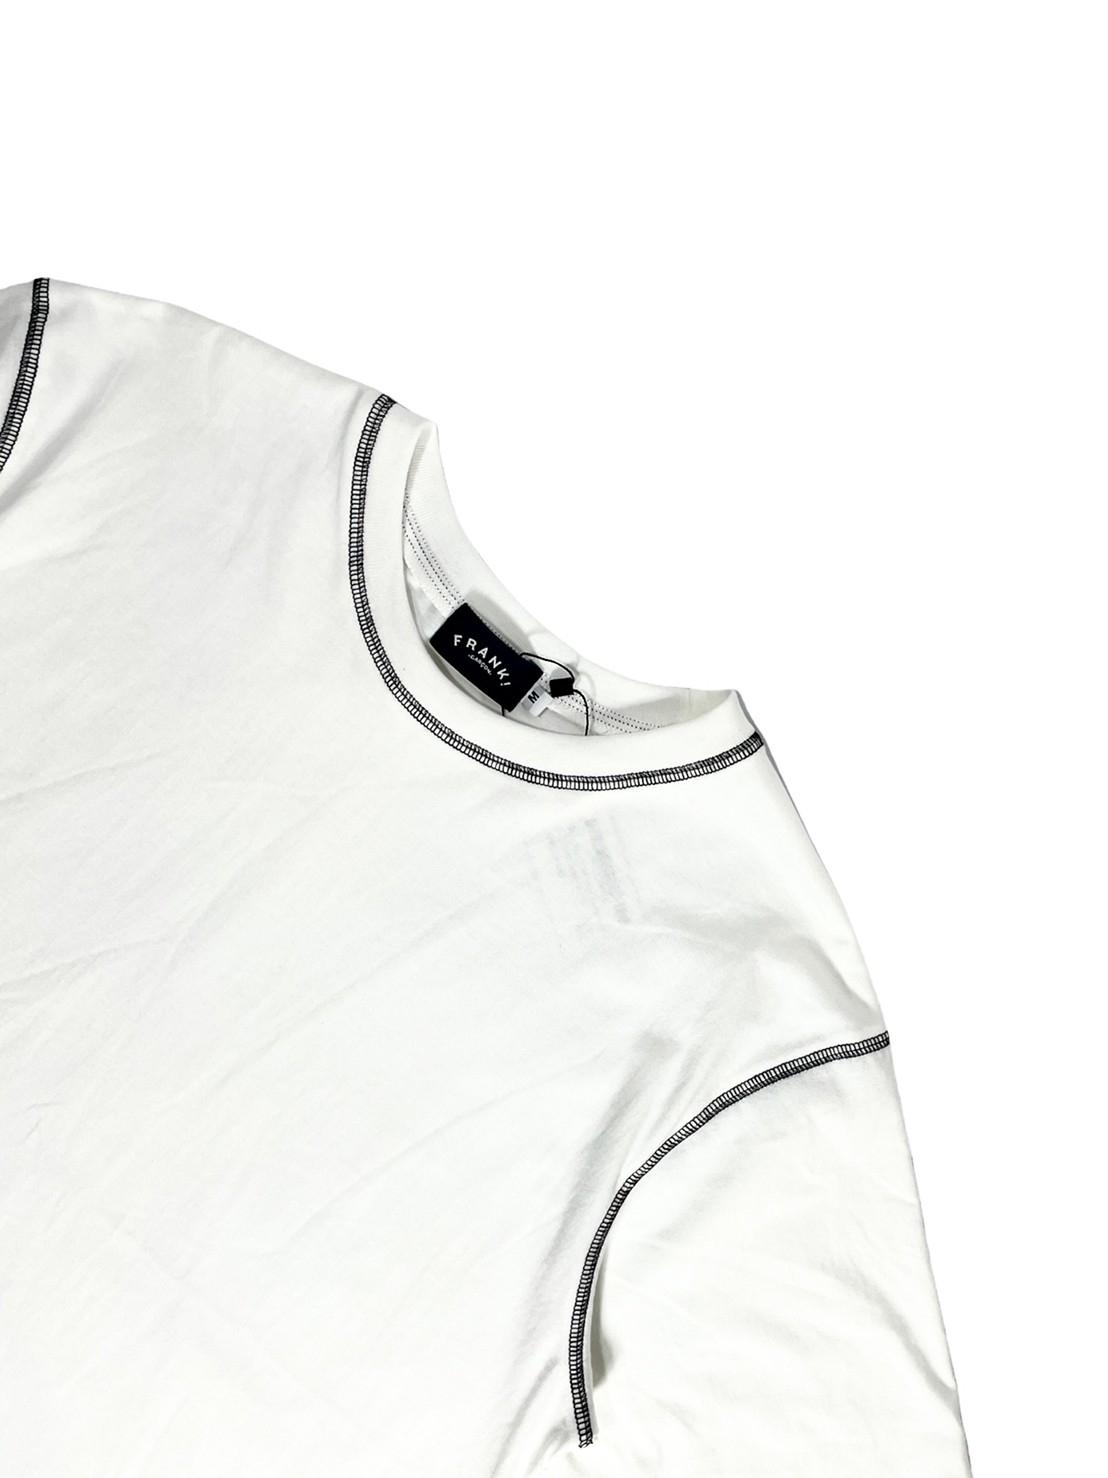 New FRANK! Logo Tee (White)